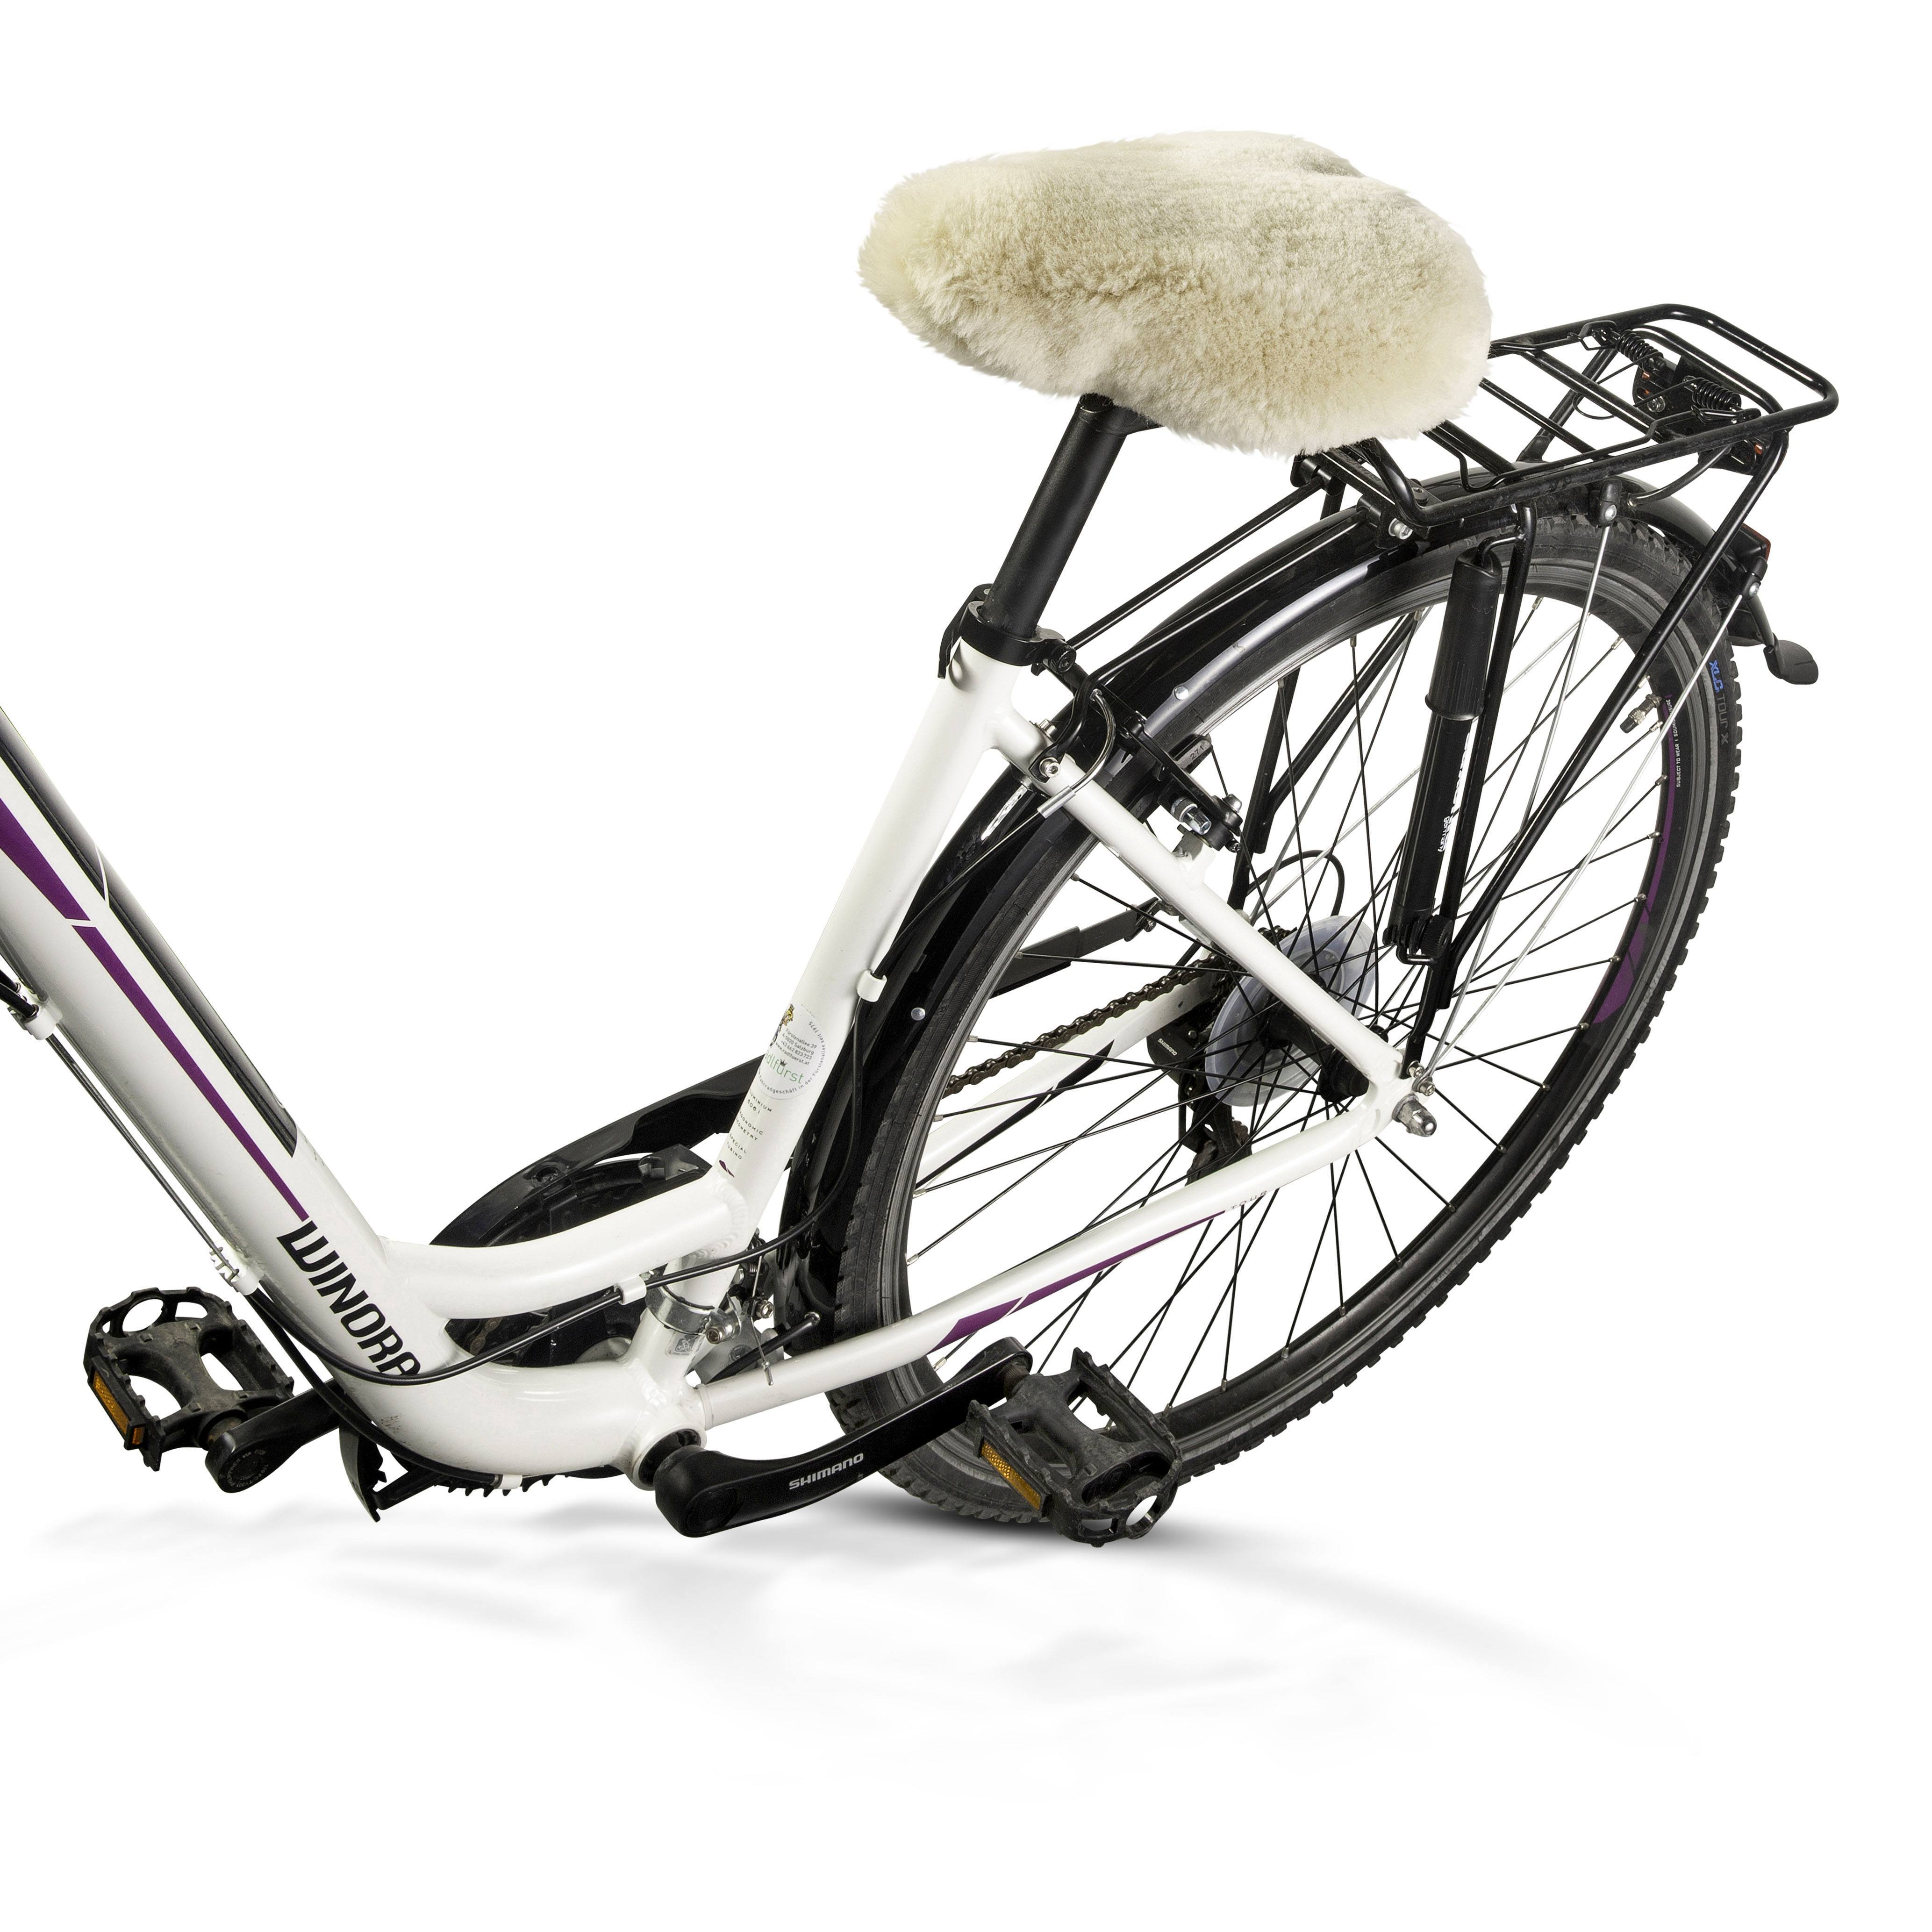 Fellhof Lambskin Bike Seat Cover